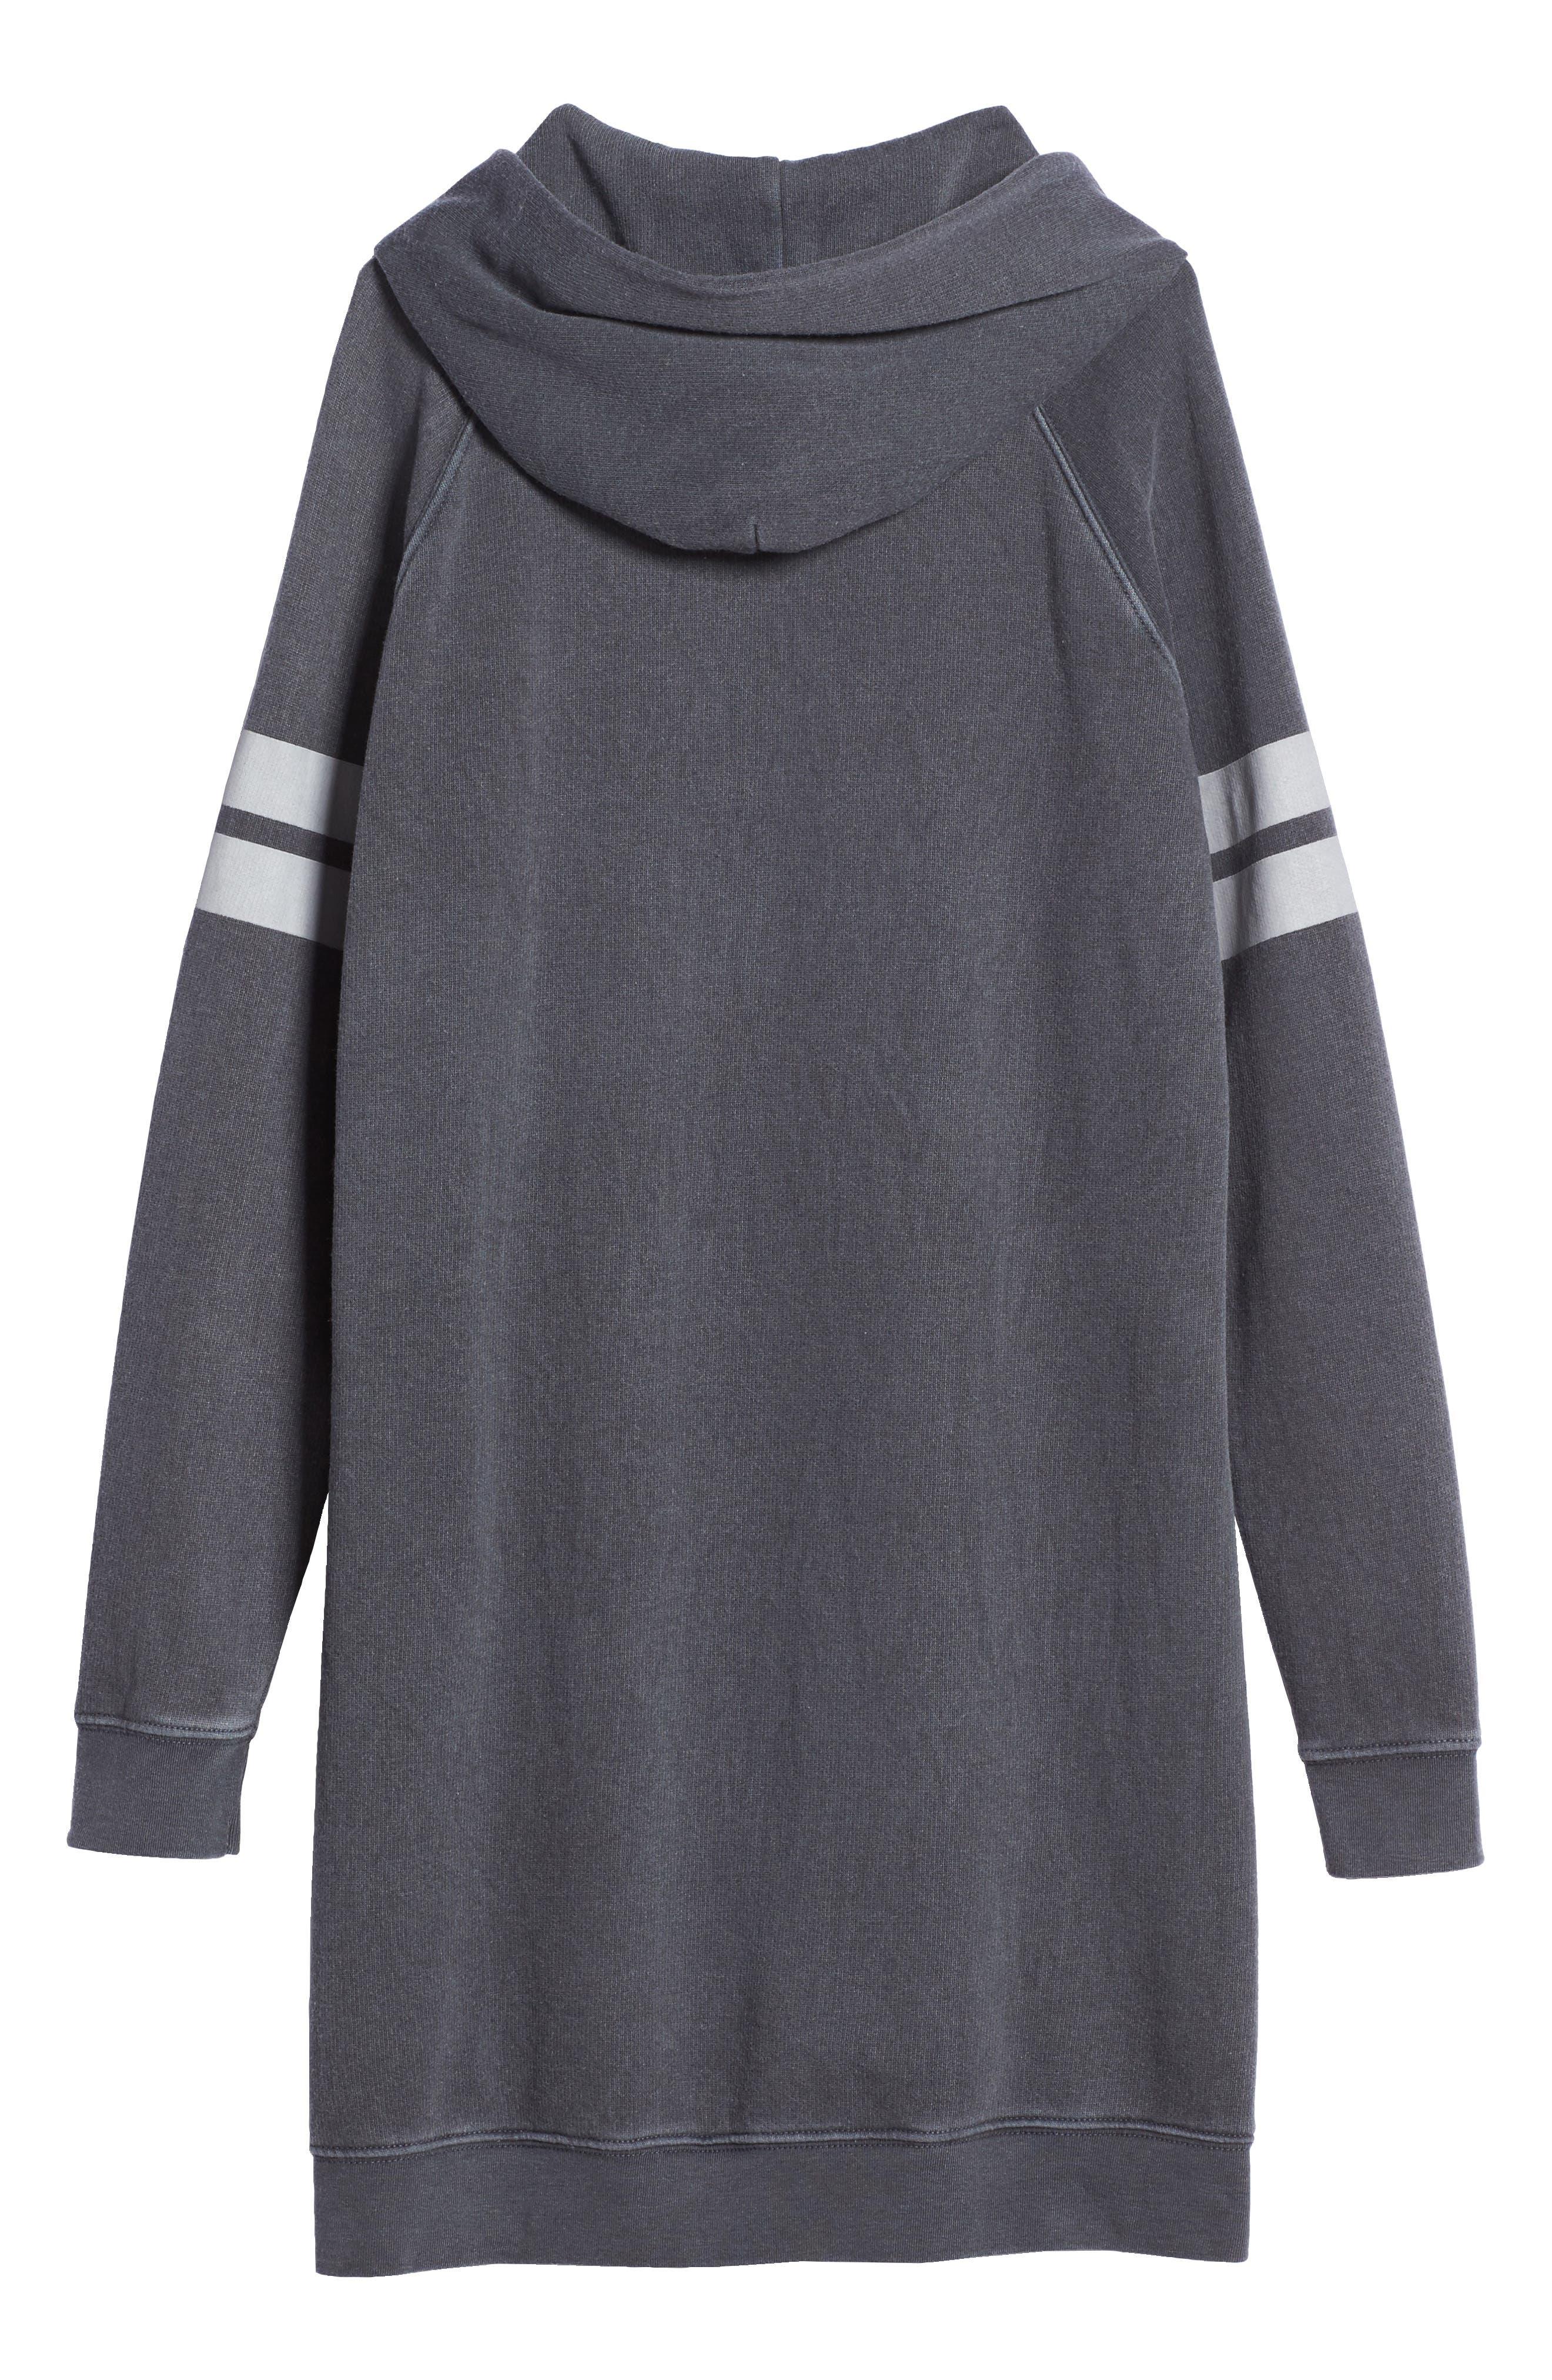 Hooded Fleece Sweatshirt Dress,                             Alternate thumbnail 2, color,                             030